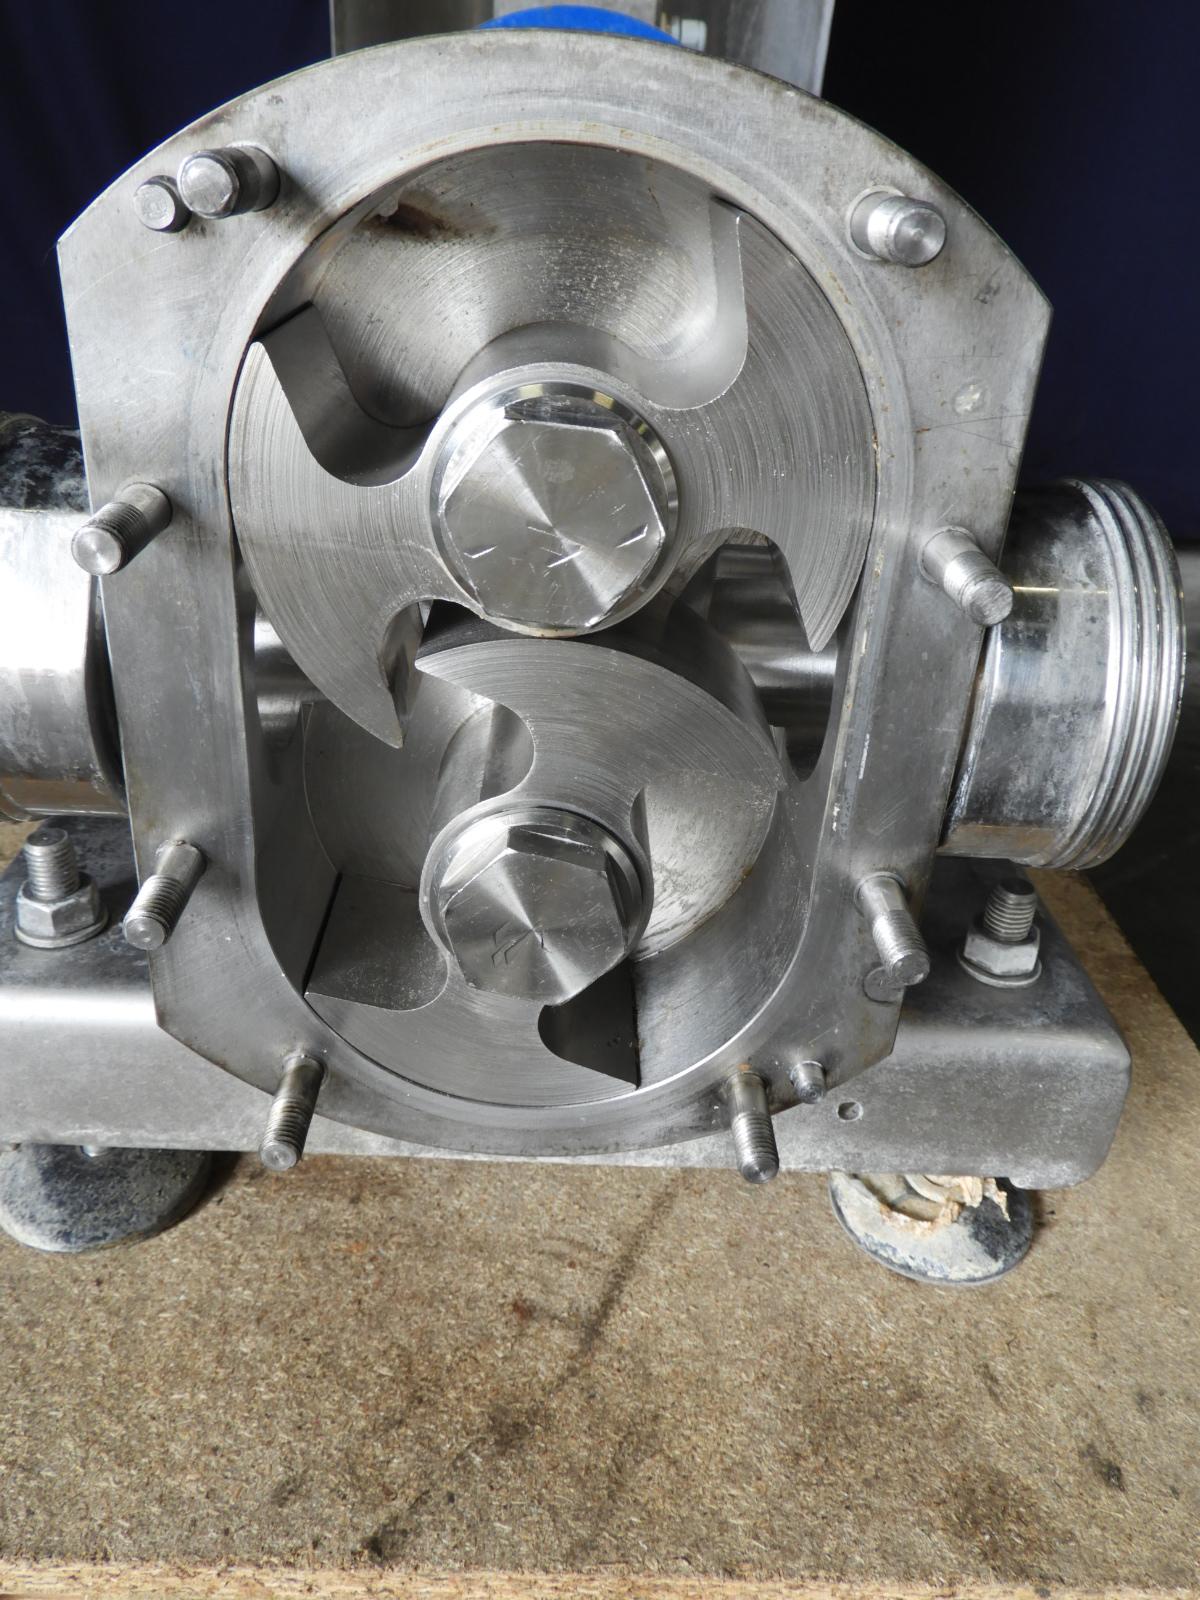 OMAC B325 5250 EH Lobe rotary pumps